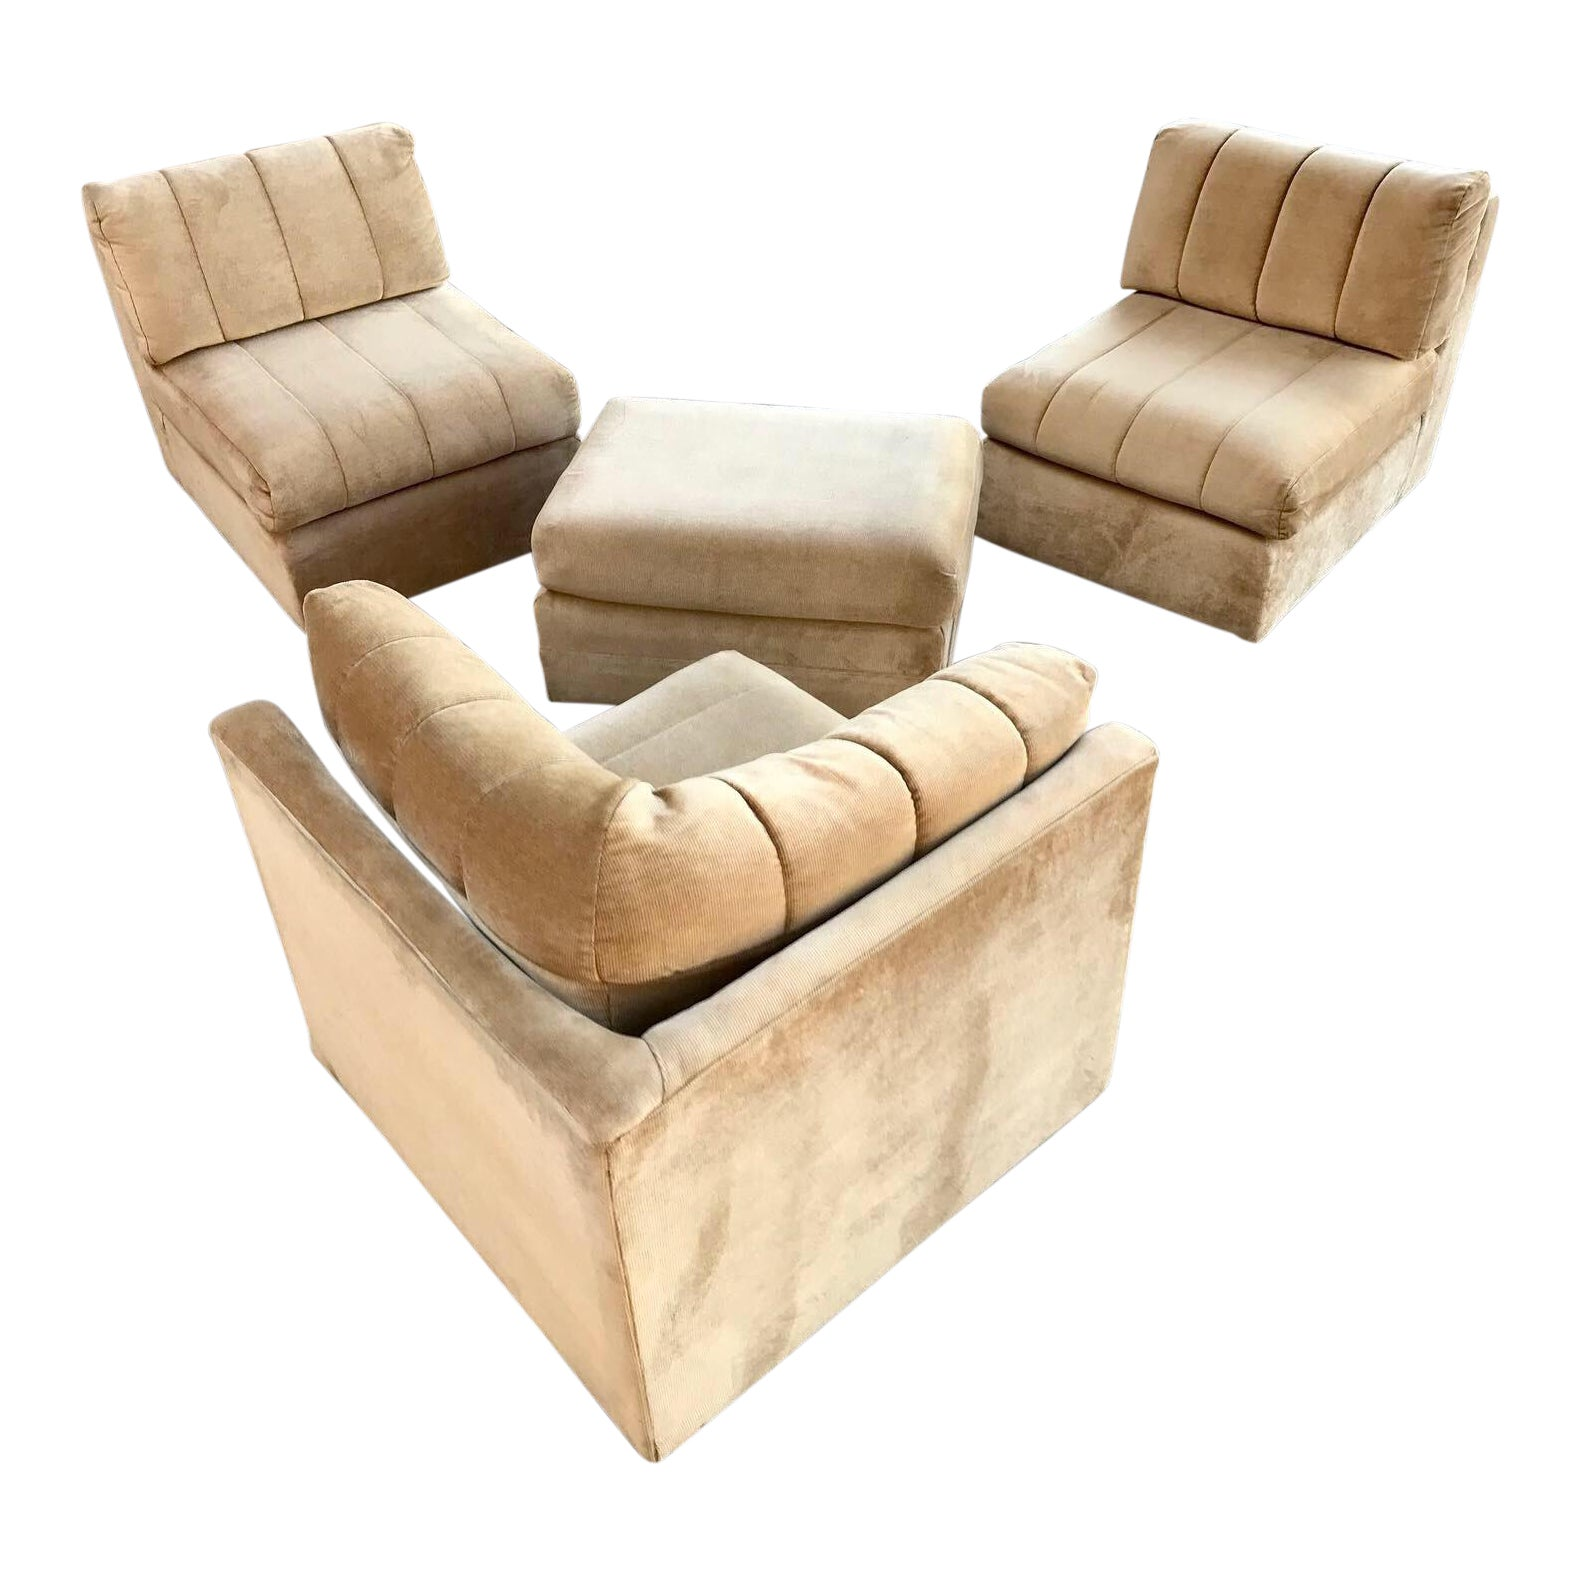 Vintage Broyhill Modular Sectional Sofa | Chairish